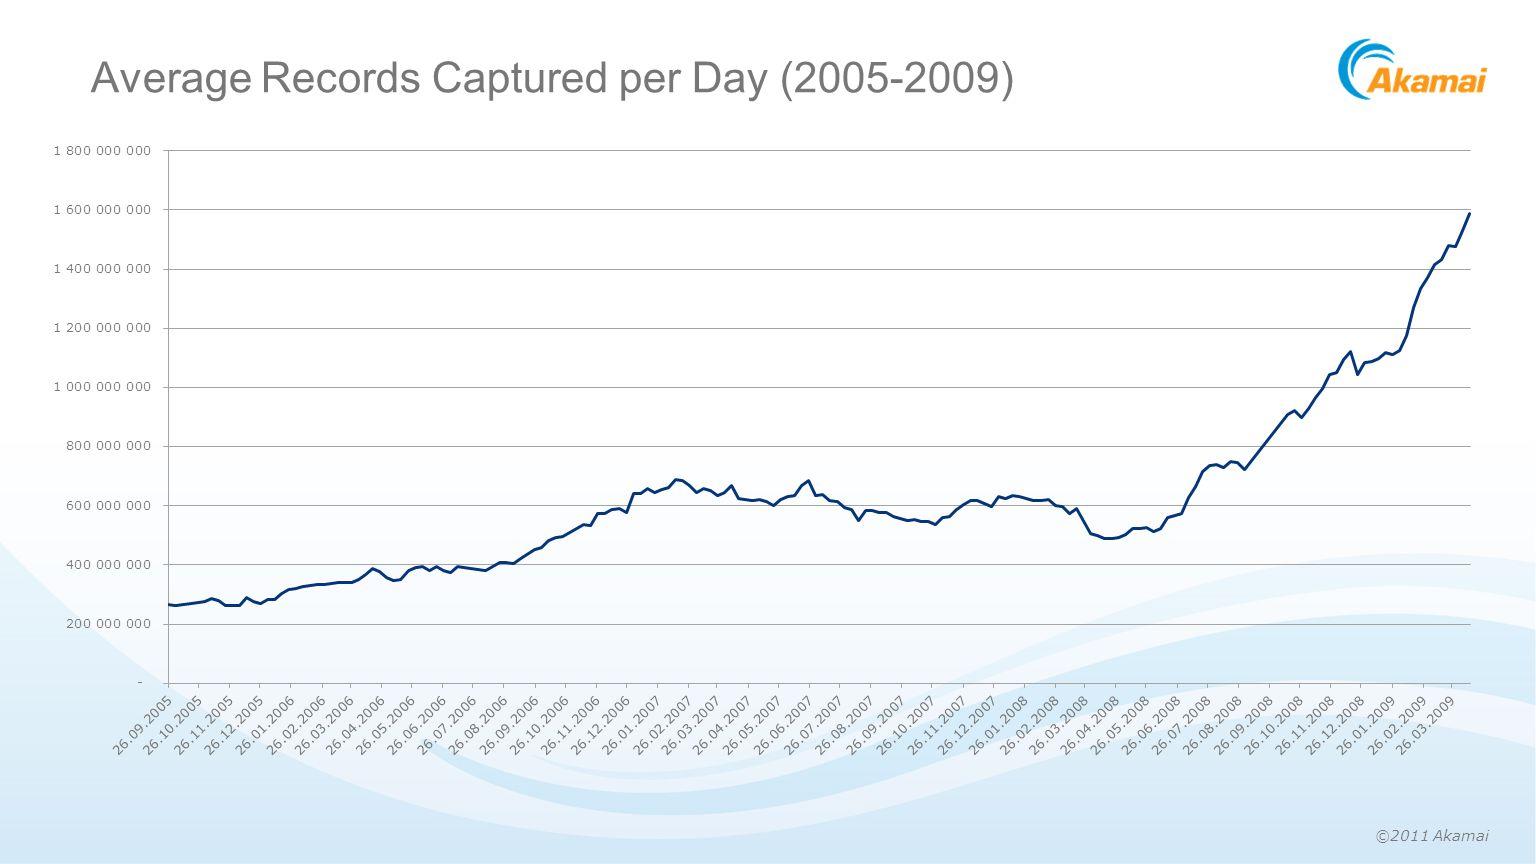 ©2011 Akamai Average Records Captured per Day (2005-2009)